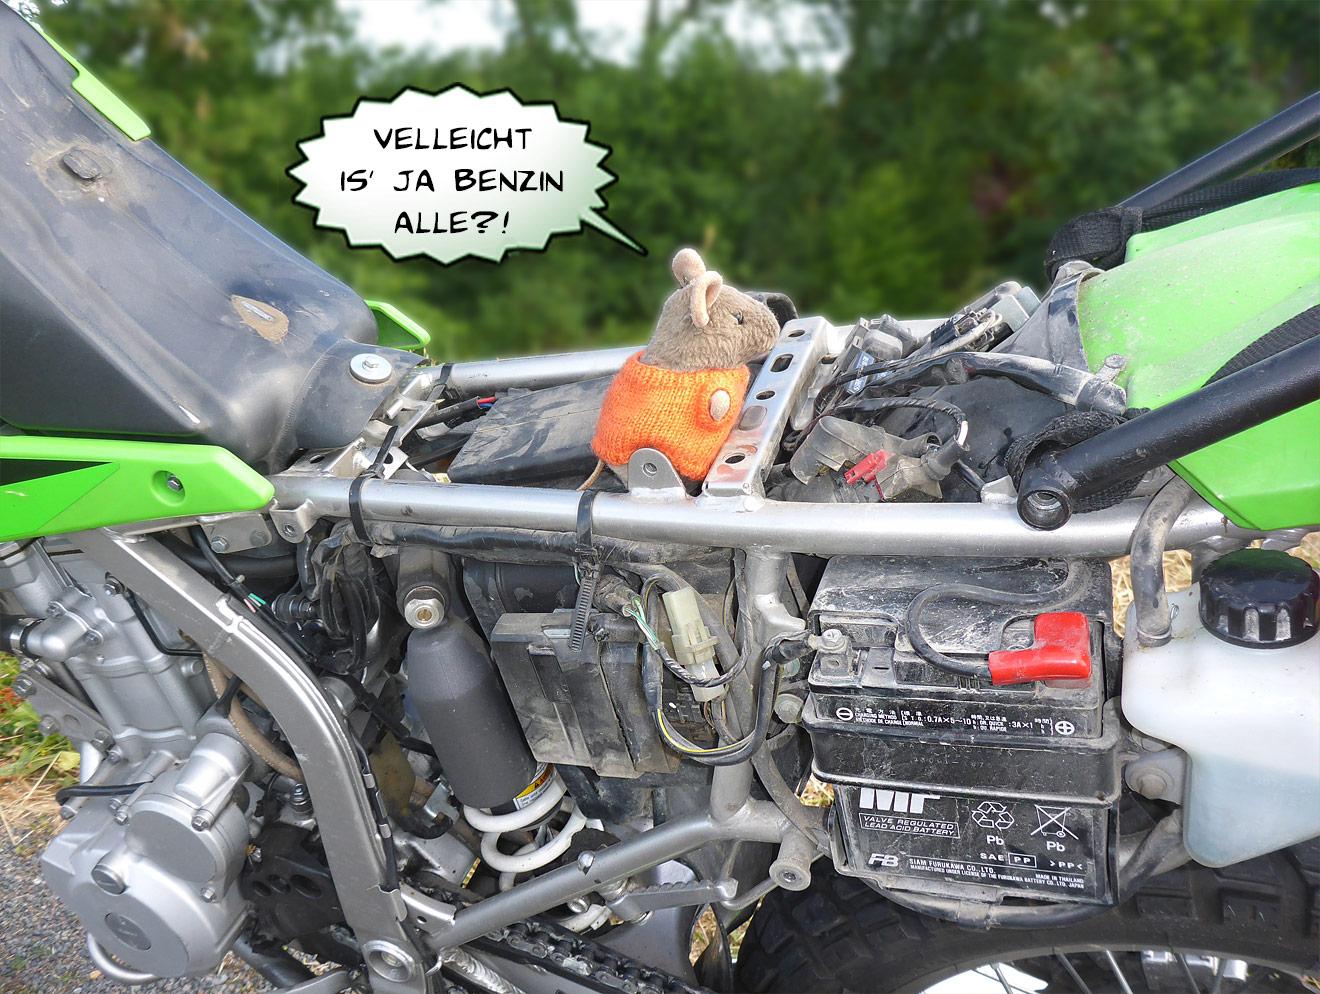 Pannenhelfer am Motorrad